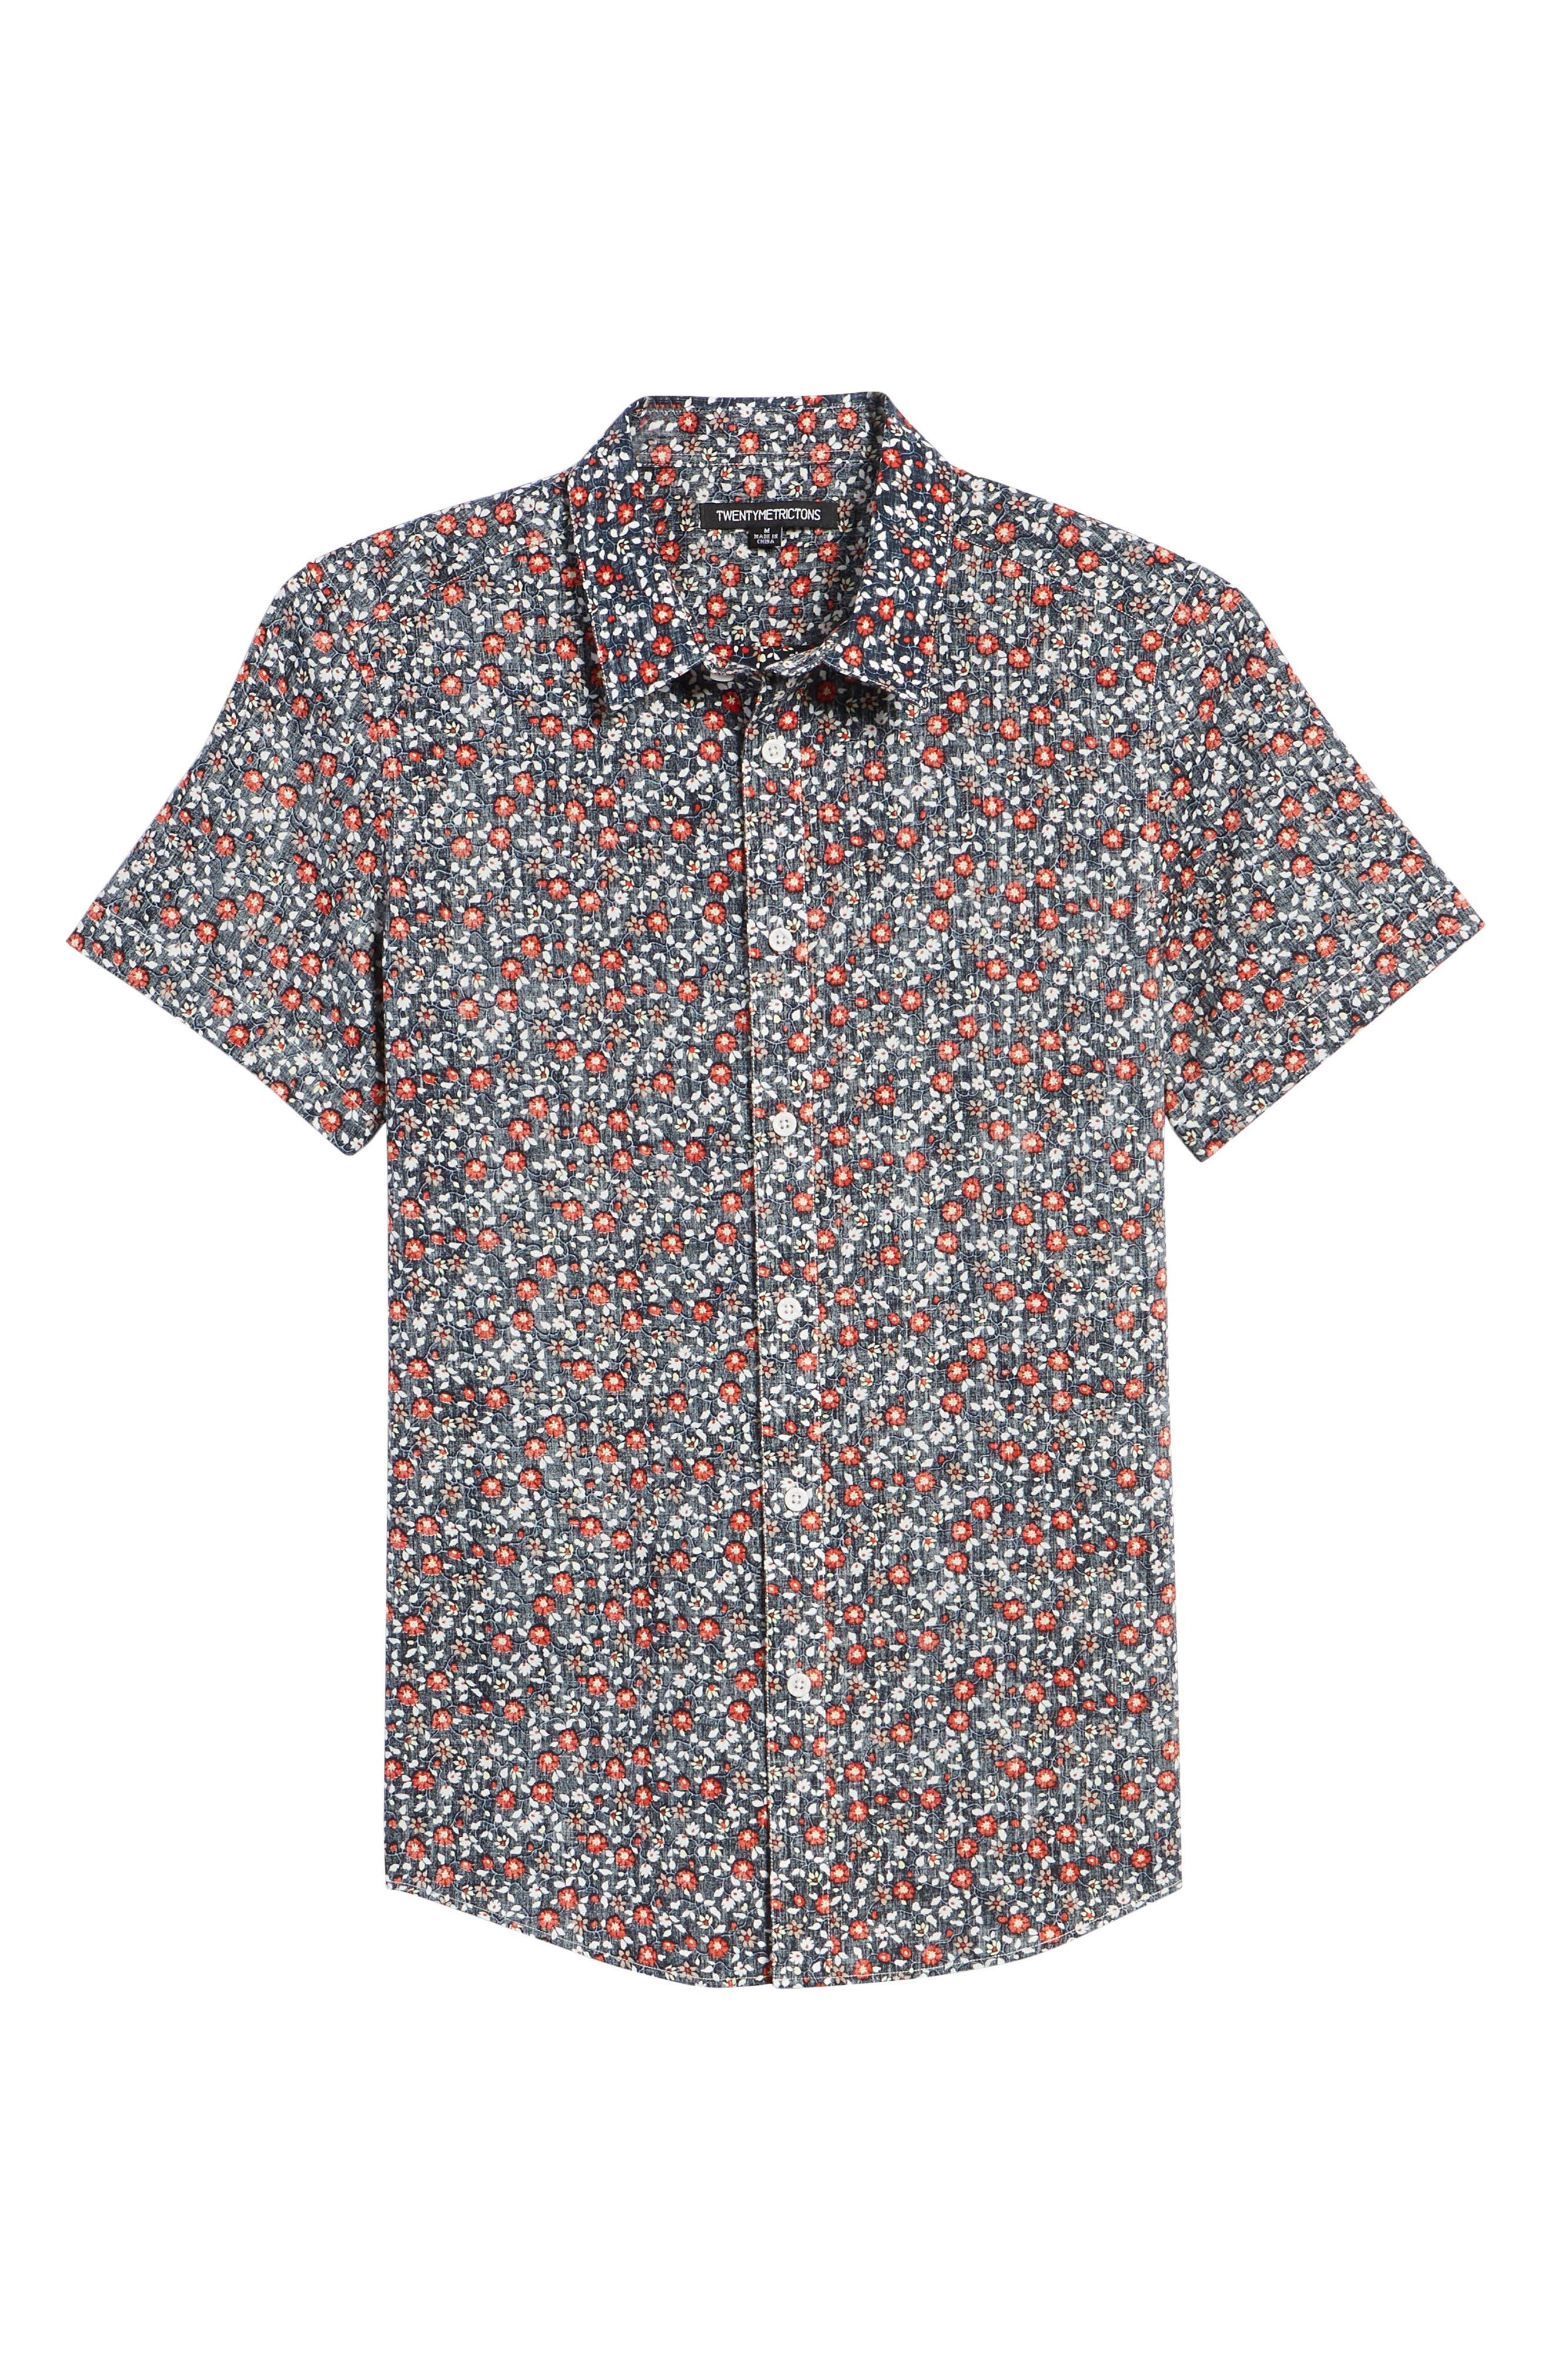 Trim Fit Print Woven Short Sleeve Shirt,                             Alternate thumbnail 6, color,                             400